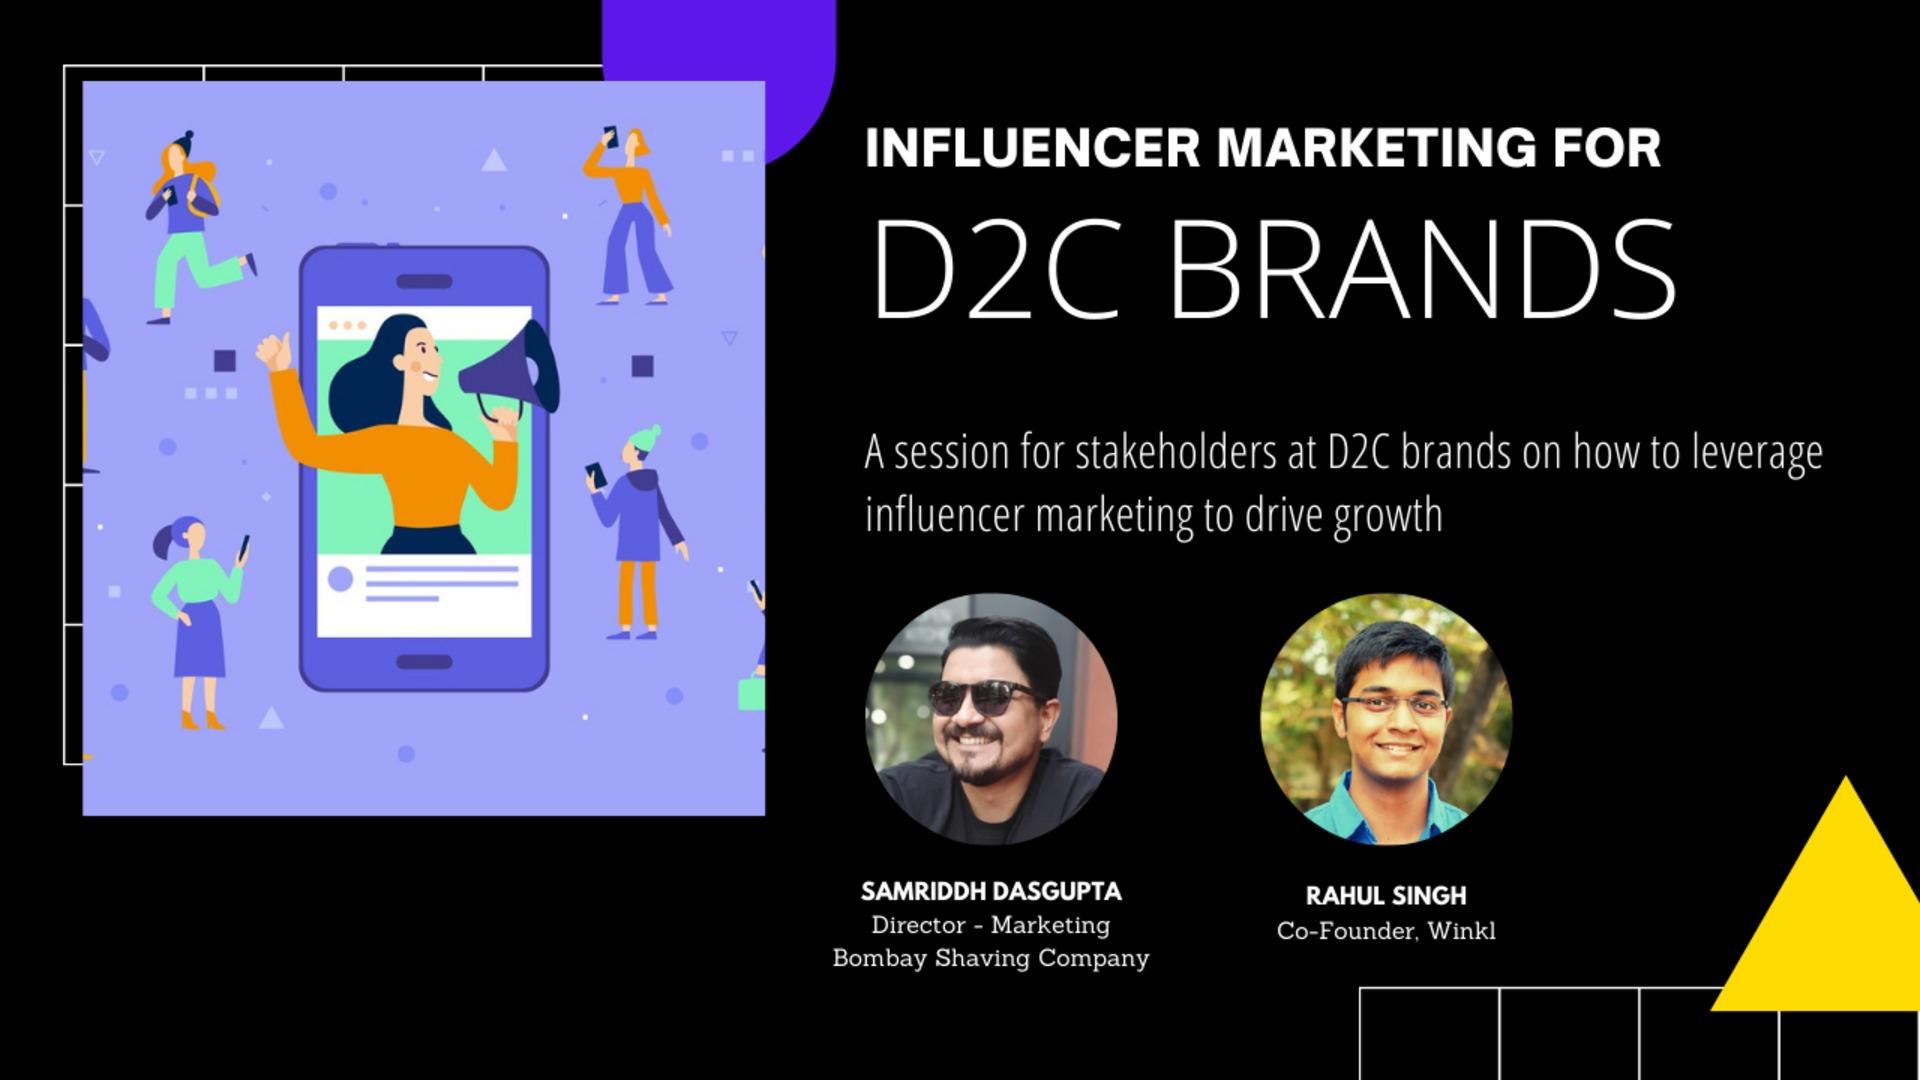 Winkl Chats: Influencer Marketing for D2C Brands with Samriddh Dasgupta @ Bombay Shaving Company image